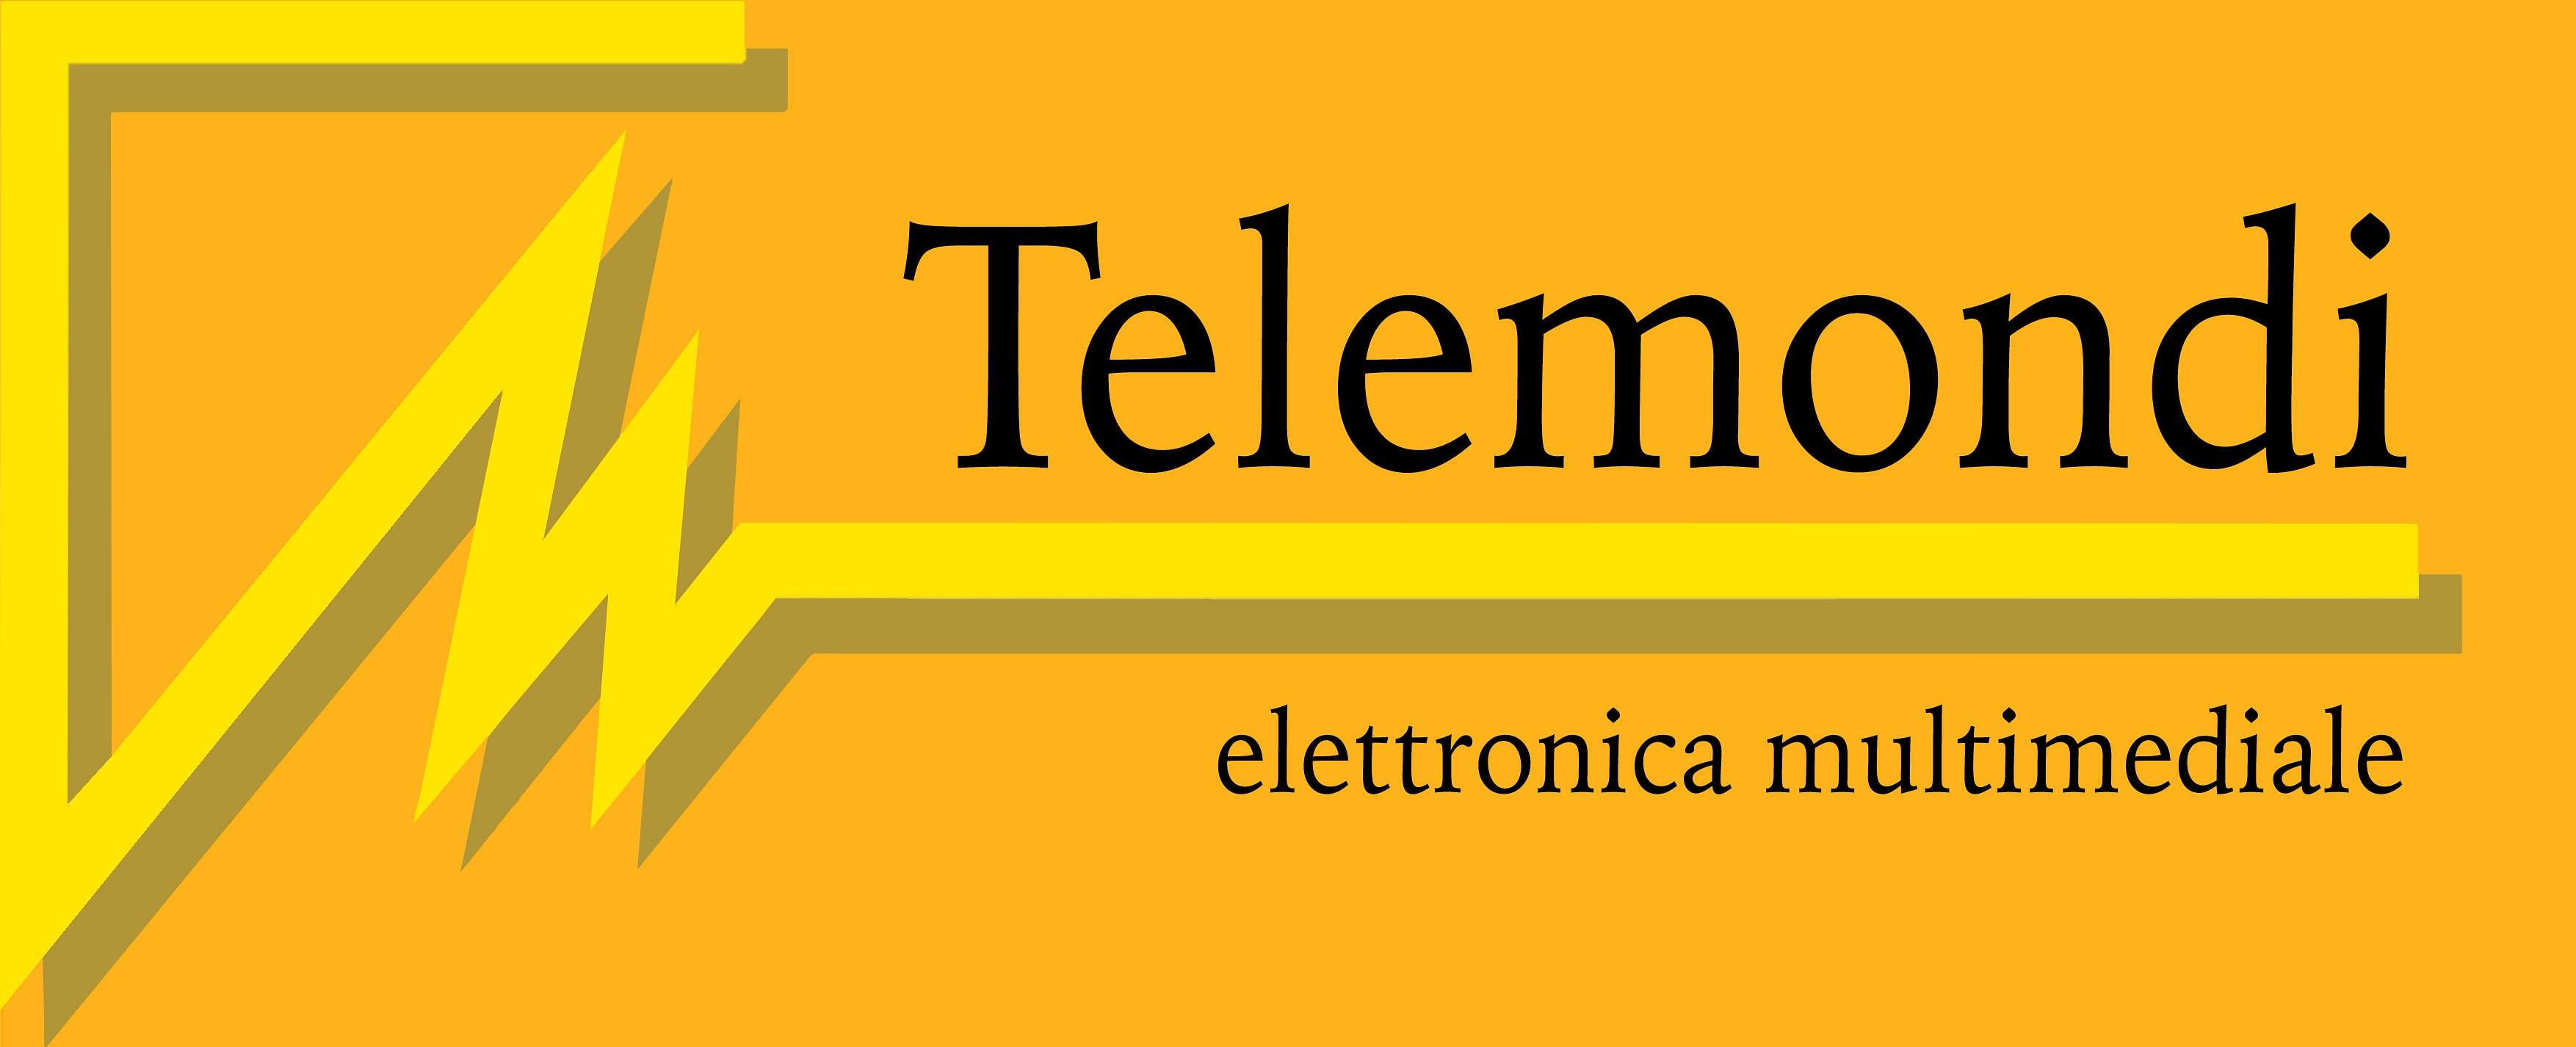 Telemondi